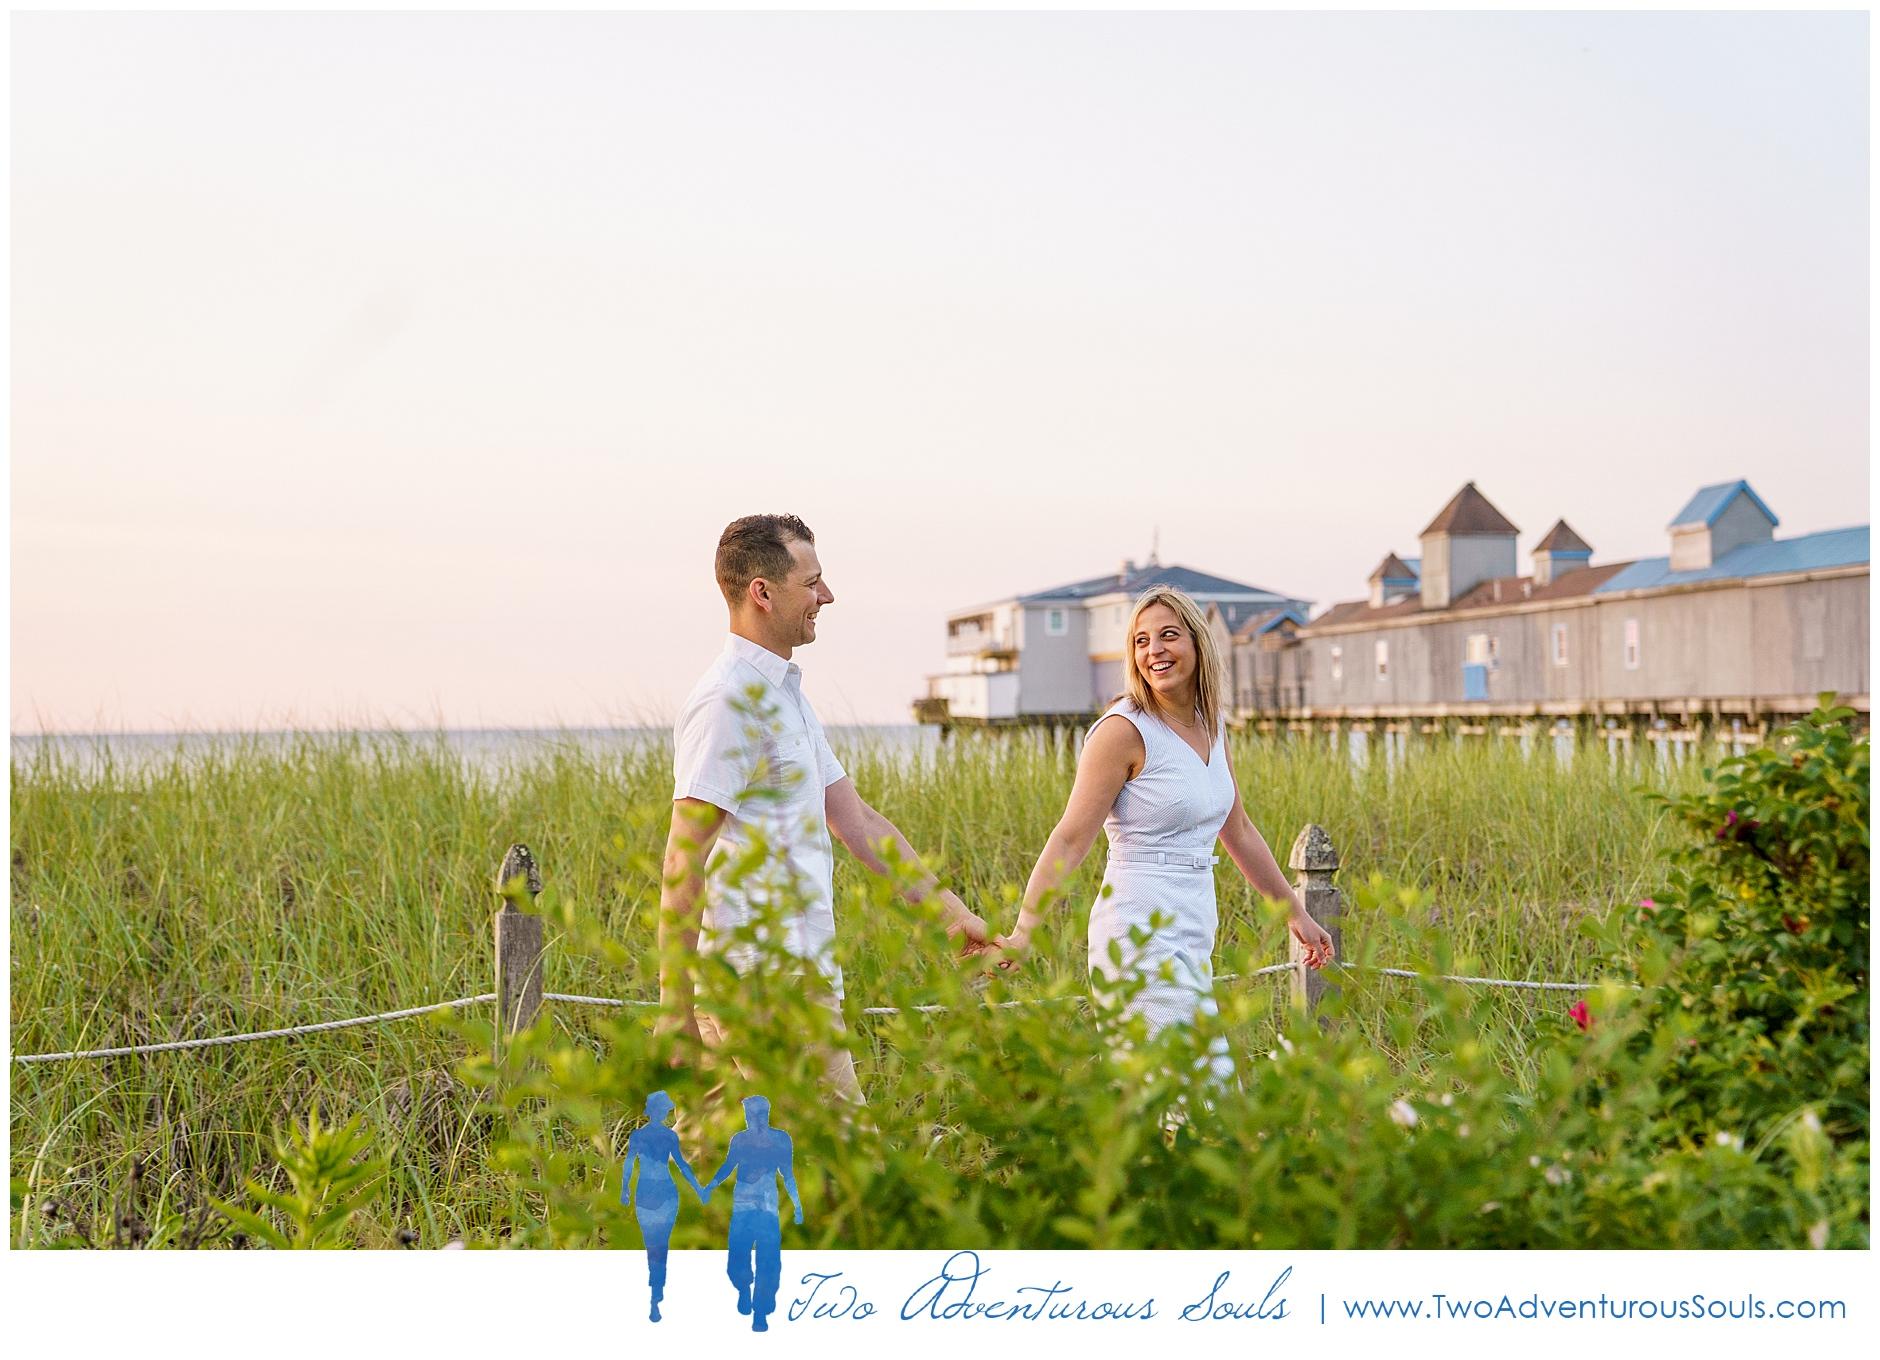 Maine Wedding Photographers, Connecticut Wedding Photographers, Old Orchard Beach Wedding Photographers, Two Adventurous Souls-JustinElise_0008.jpg